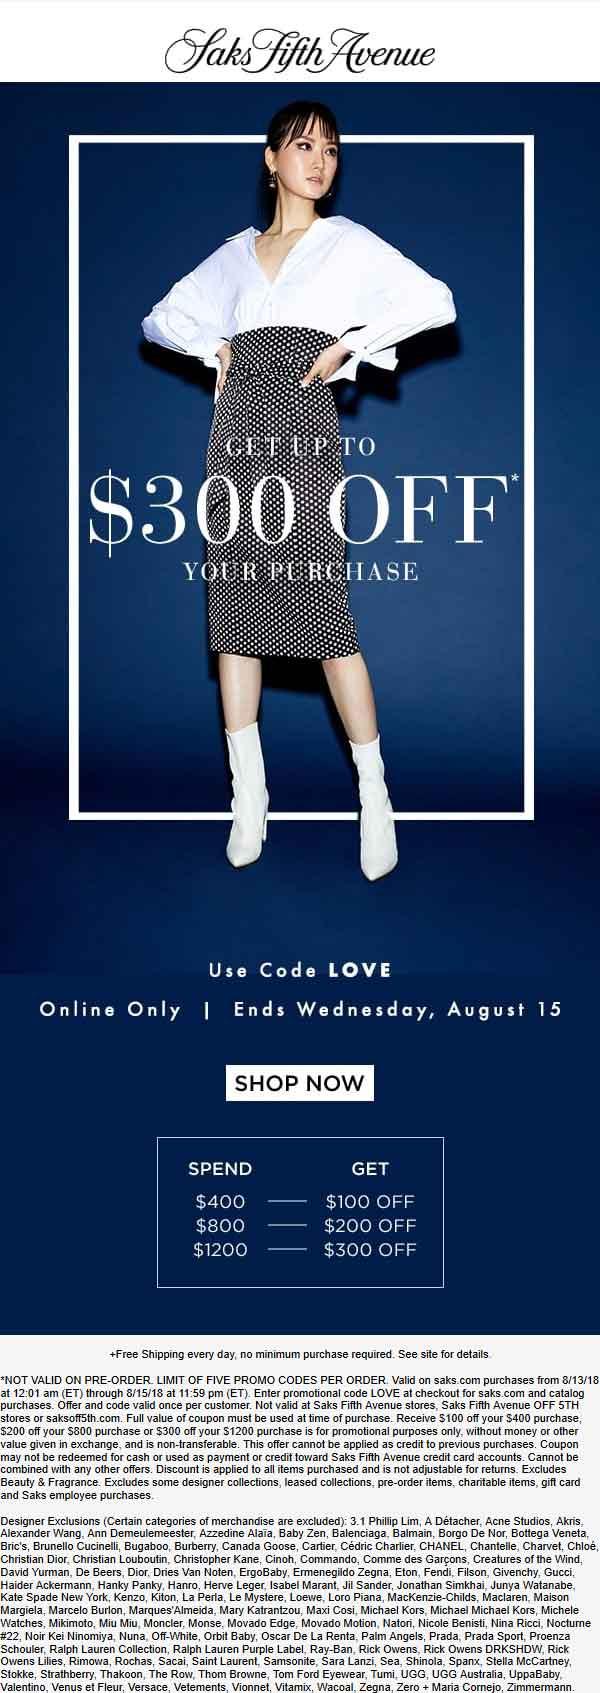 SaksFifthAvenue.com Promo Coupon $100 off $400 & more online at Saks Fifth Avenue via promo code LOVE